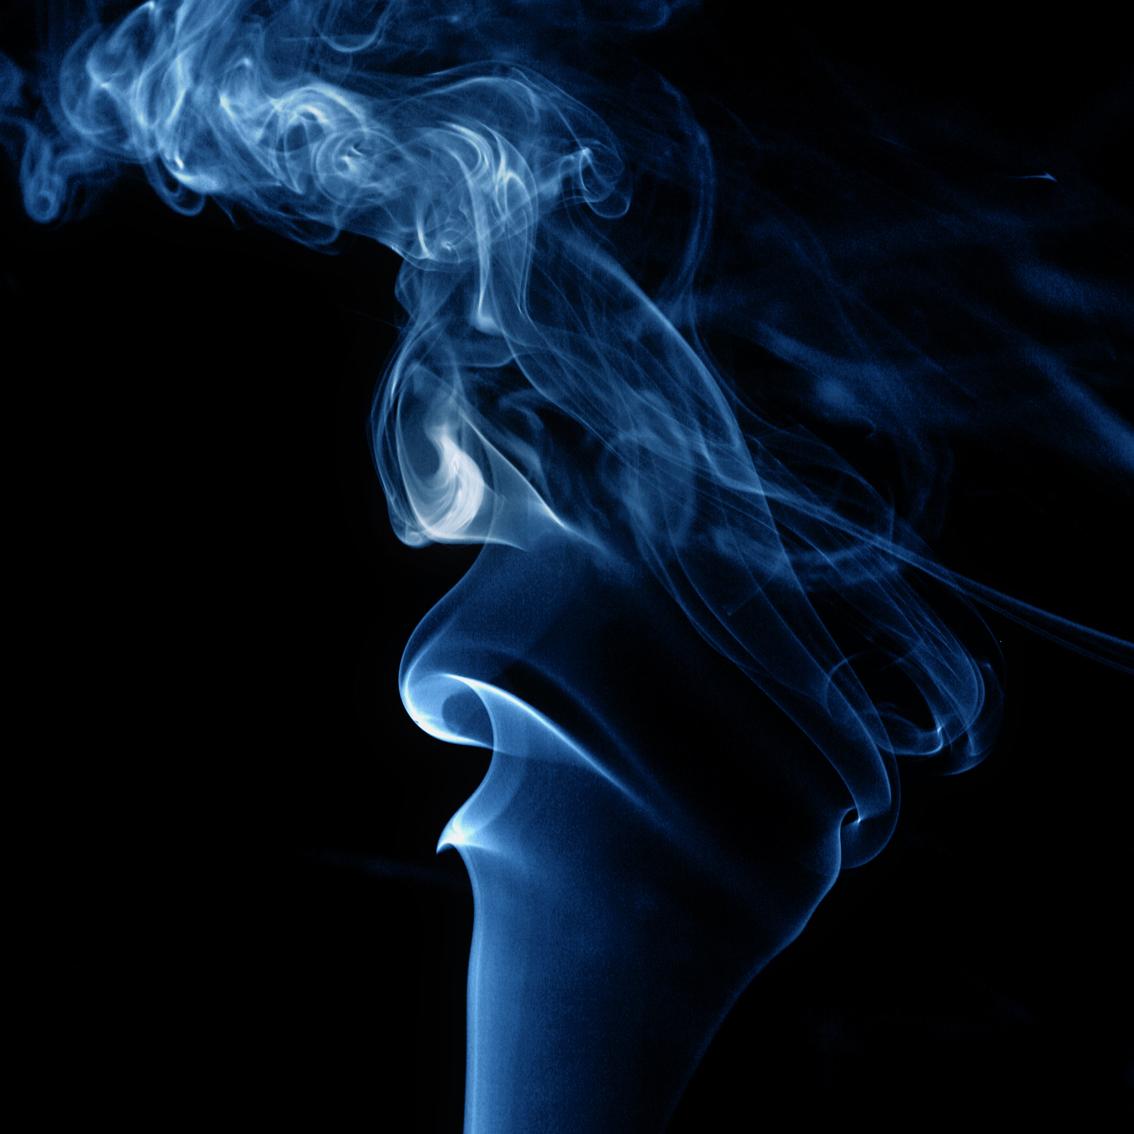 Foto di Claudio, Segnali di fumo 1